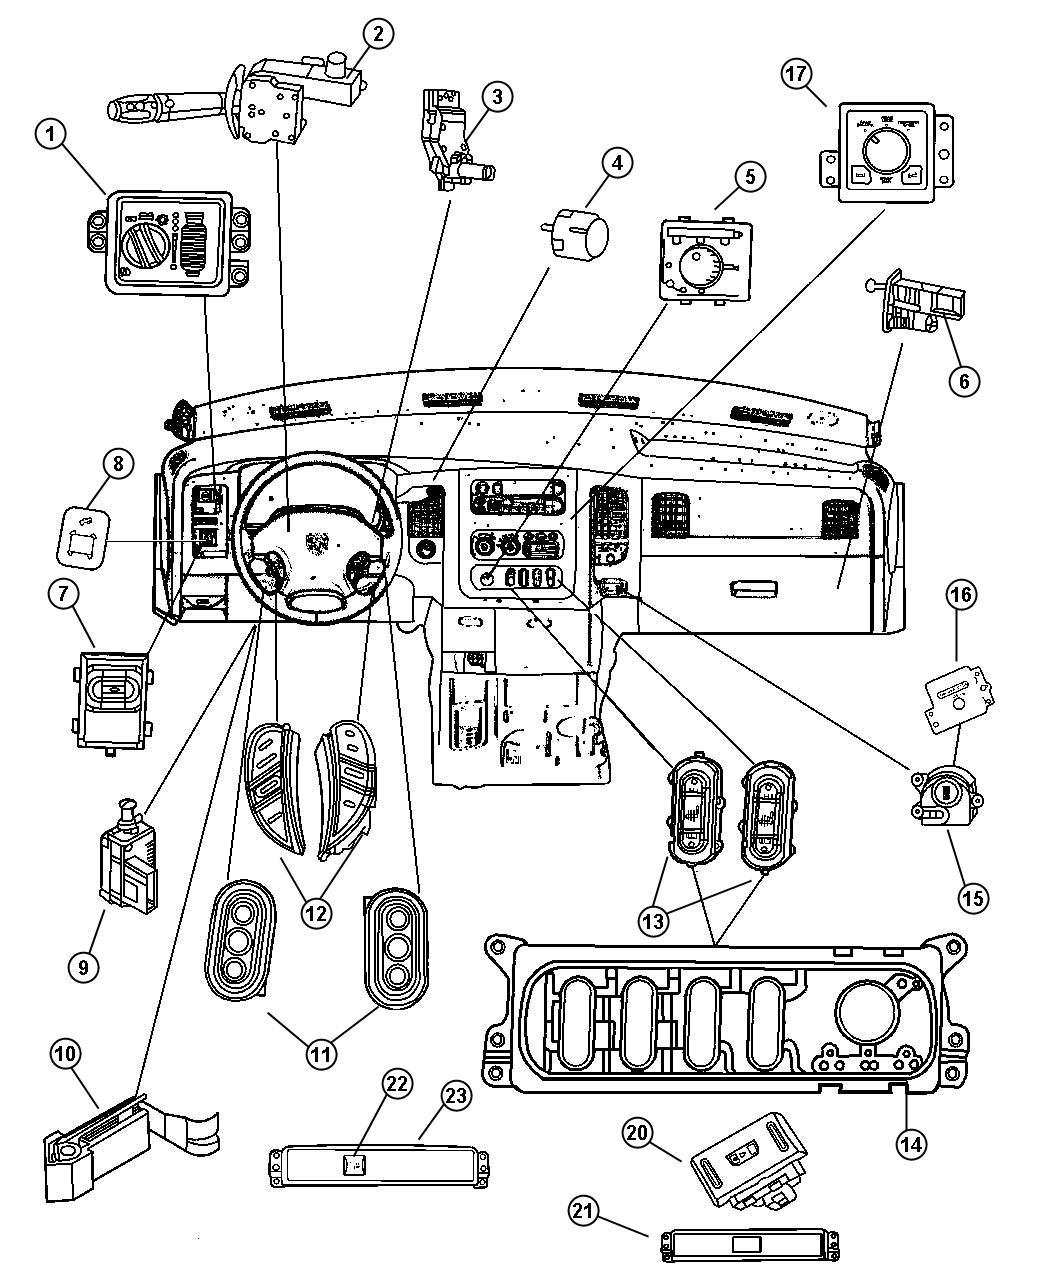 Dodge Ram 1500 Bezel. Switch. [power adjustable pedals